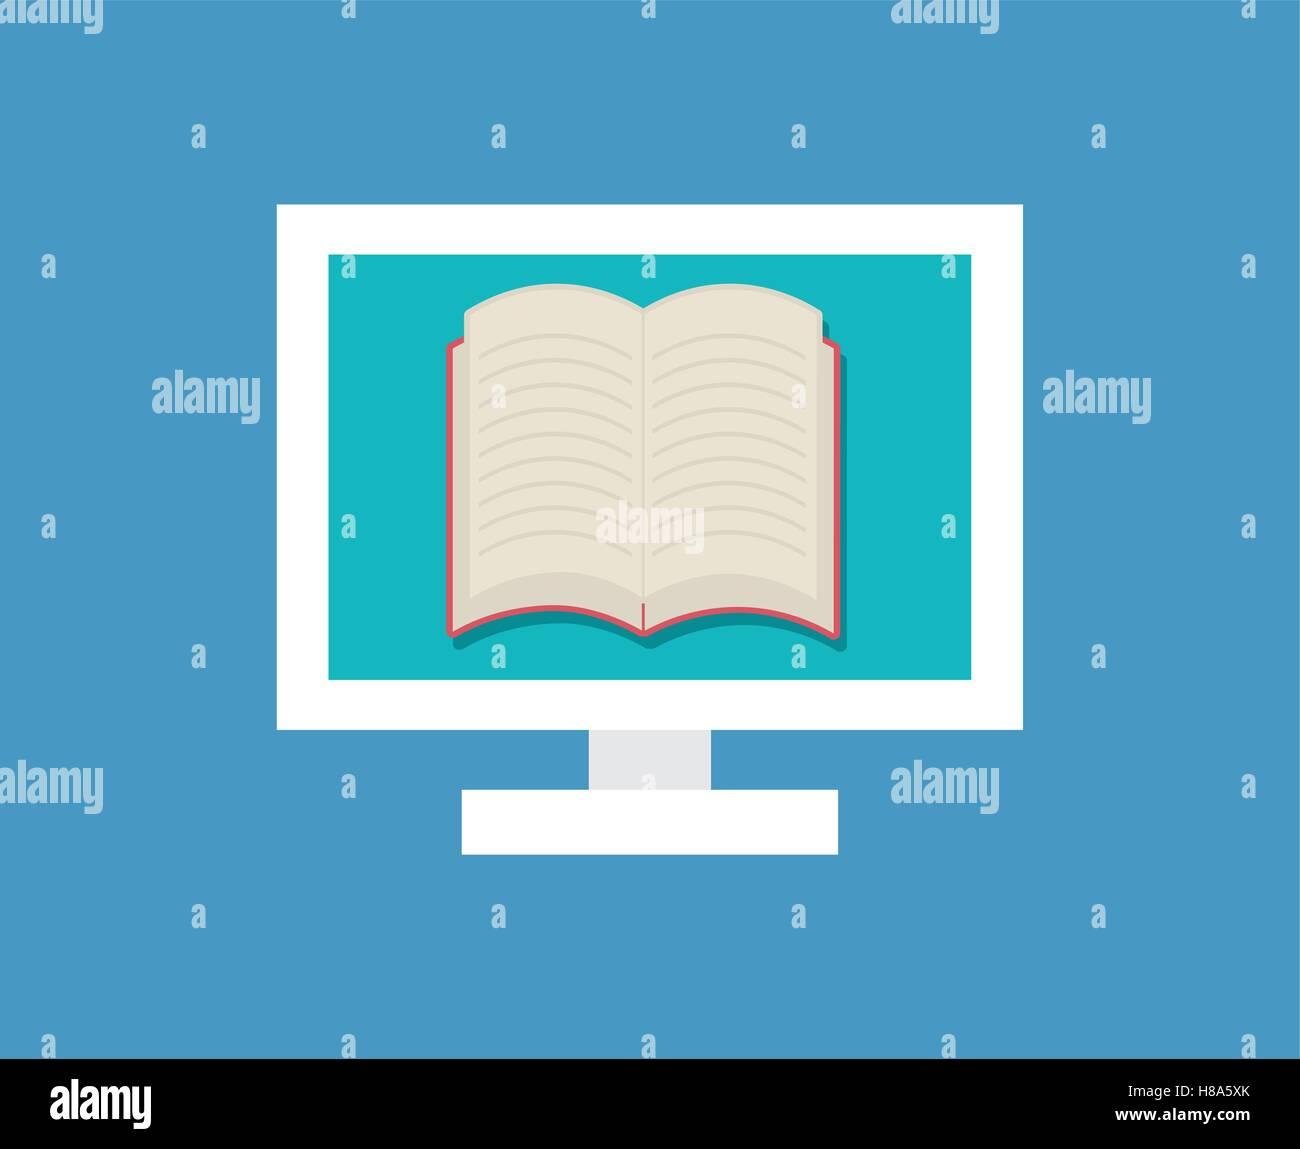 Elearning online education - Stock Image